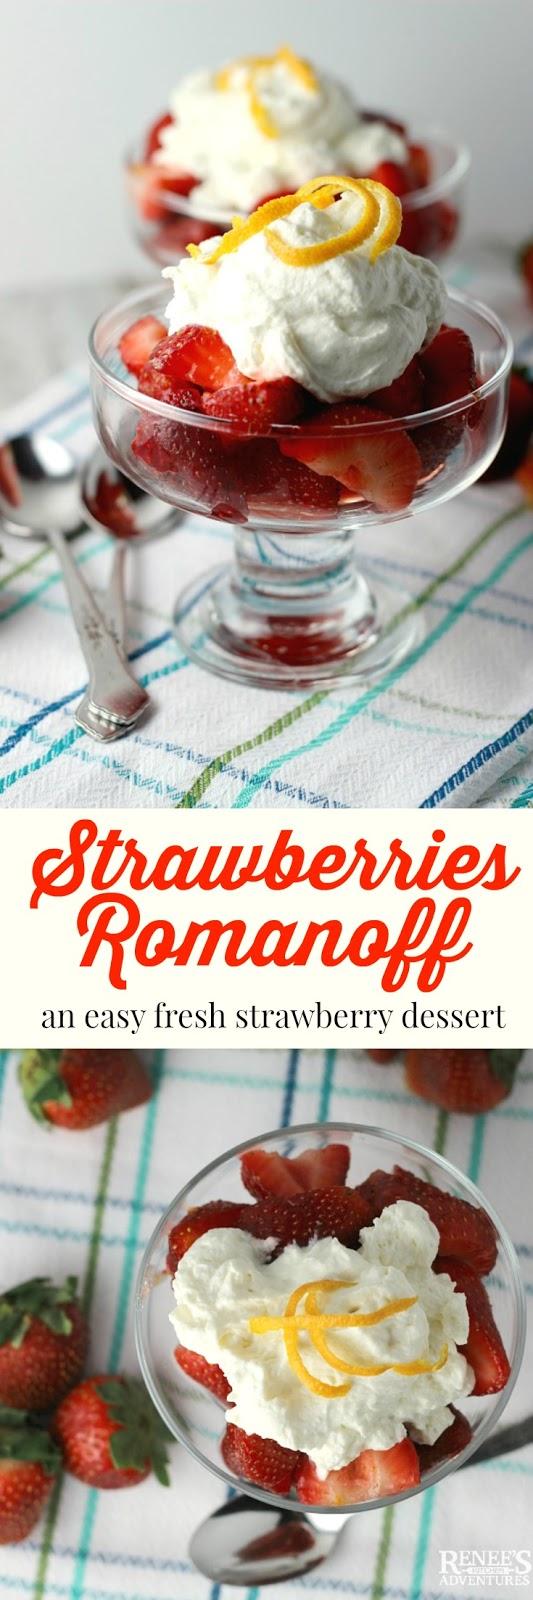 Strawberries Romanoff | Renee's Kitchen Adventures